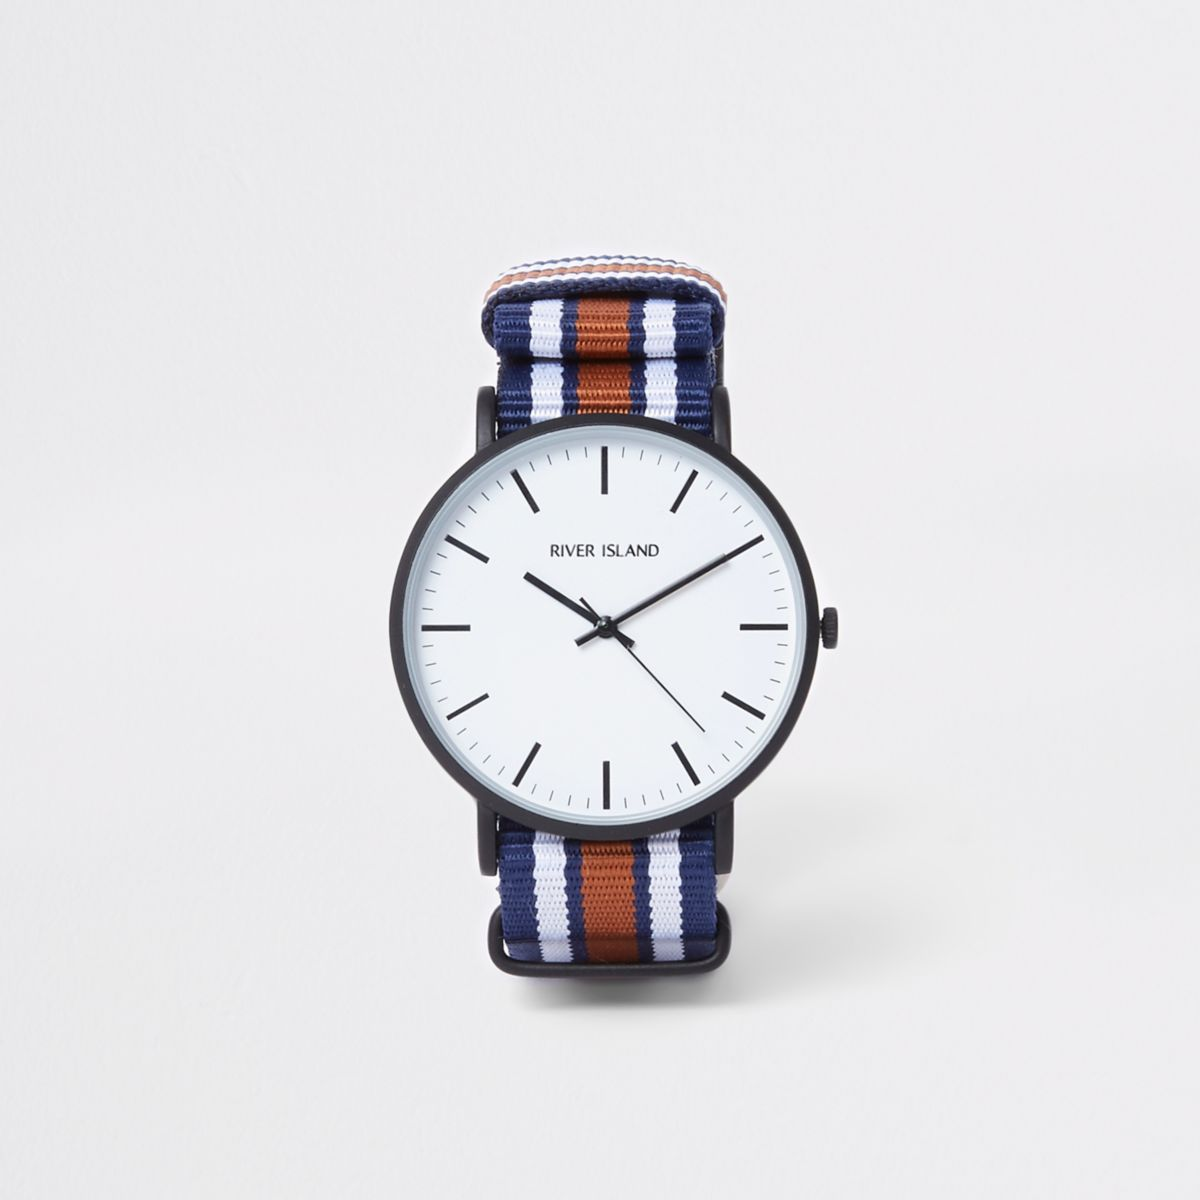 Marineblaue, runde Armbanduhr mit gestreiftem Stoffband